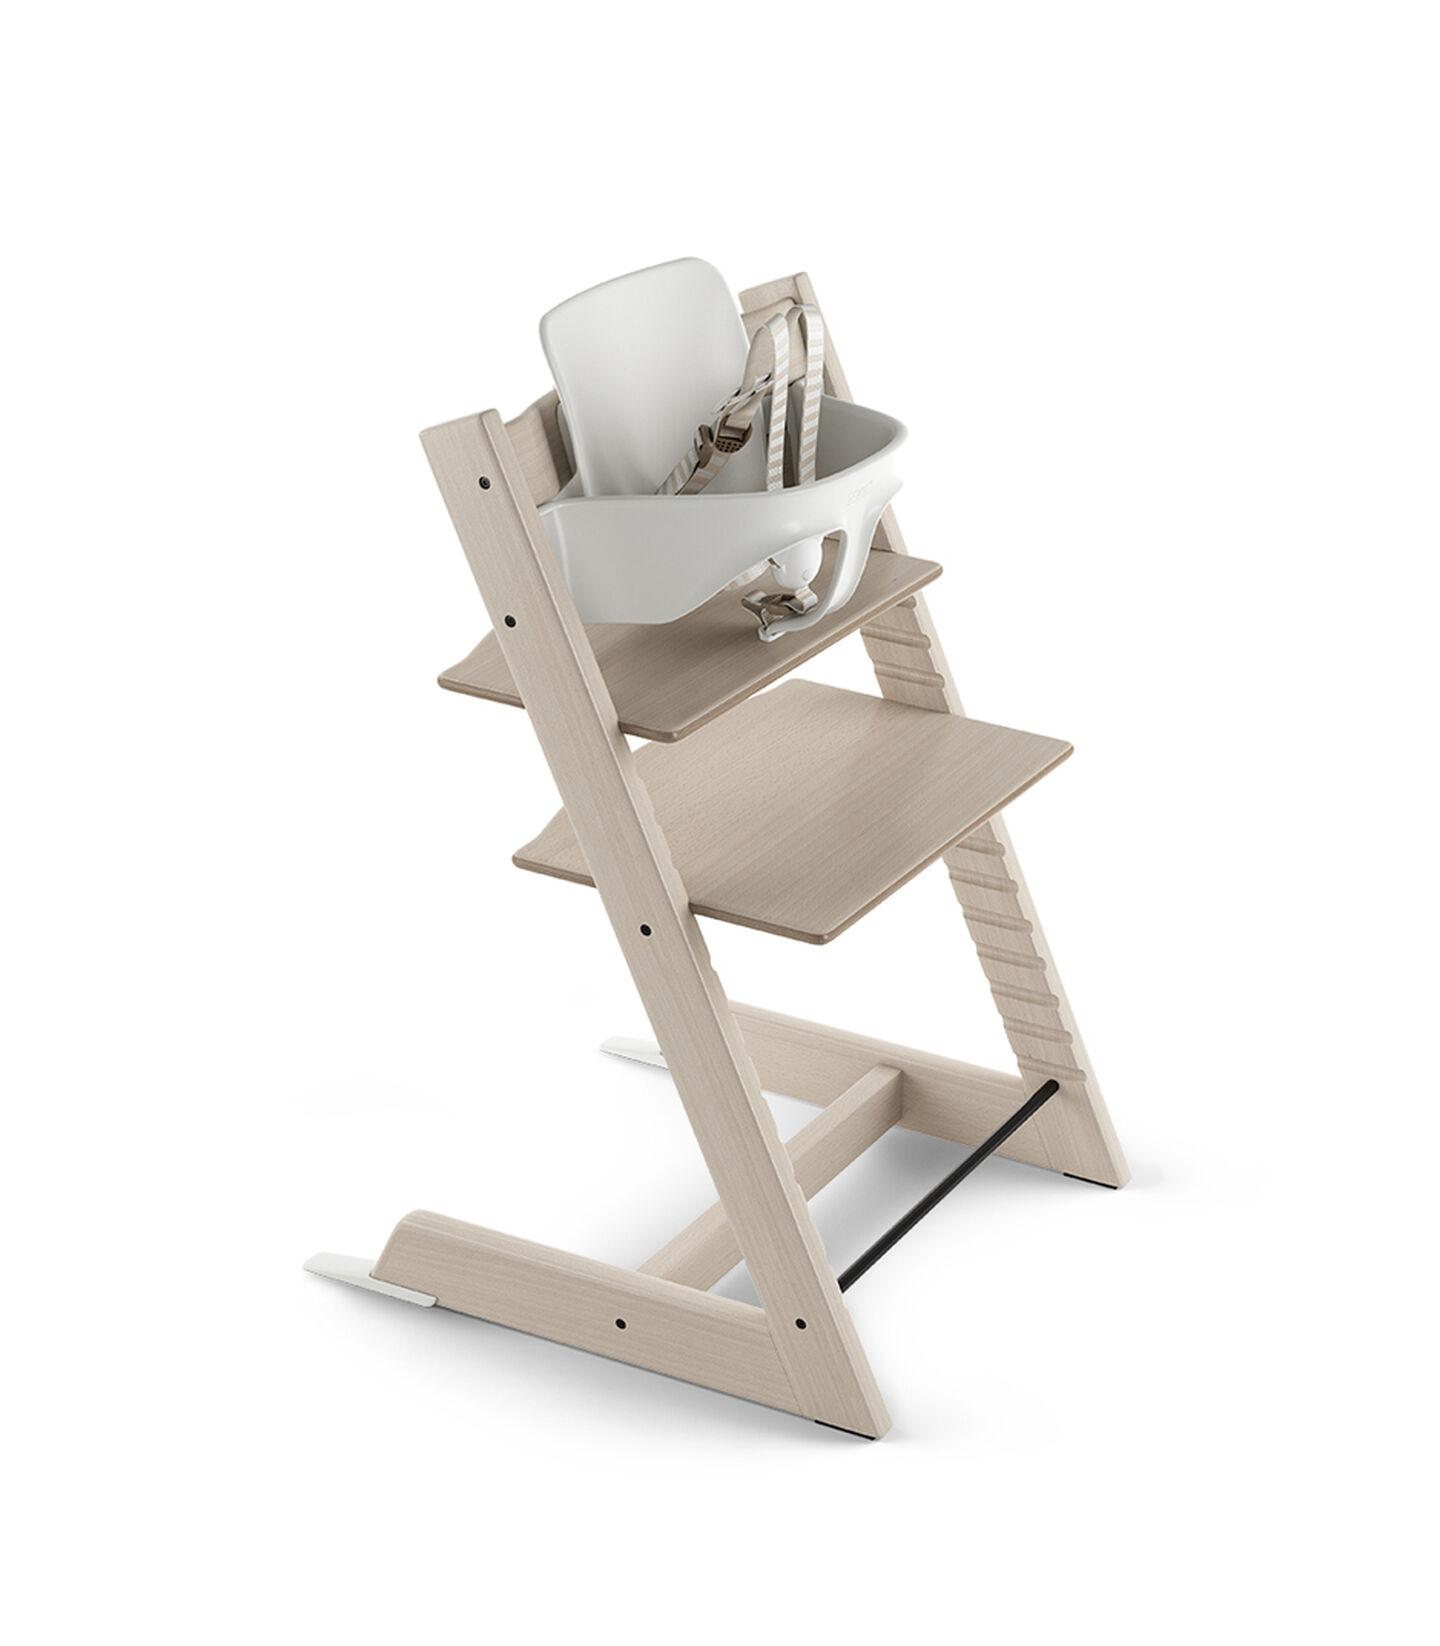 Tripp Trapp® Bundle High Chair US 18 Whitewash, Whitewash, mainview view 2